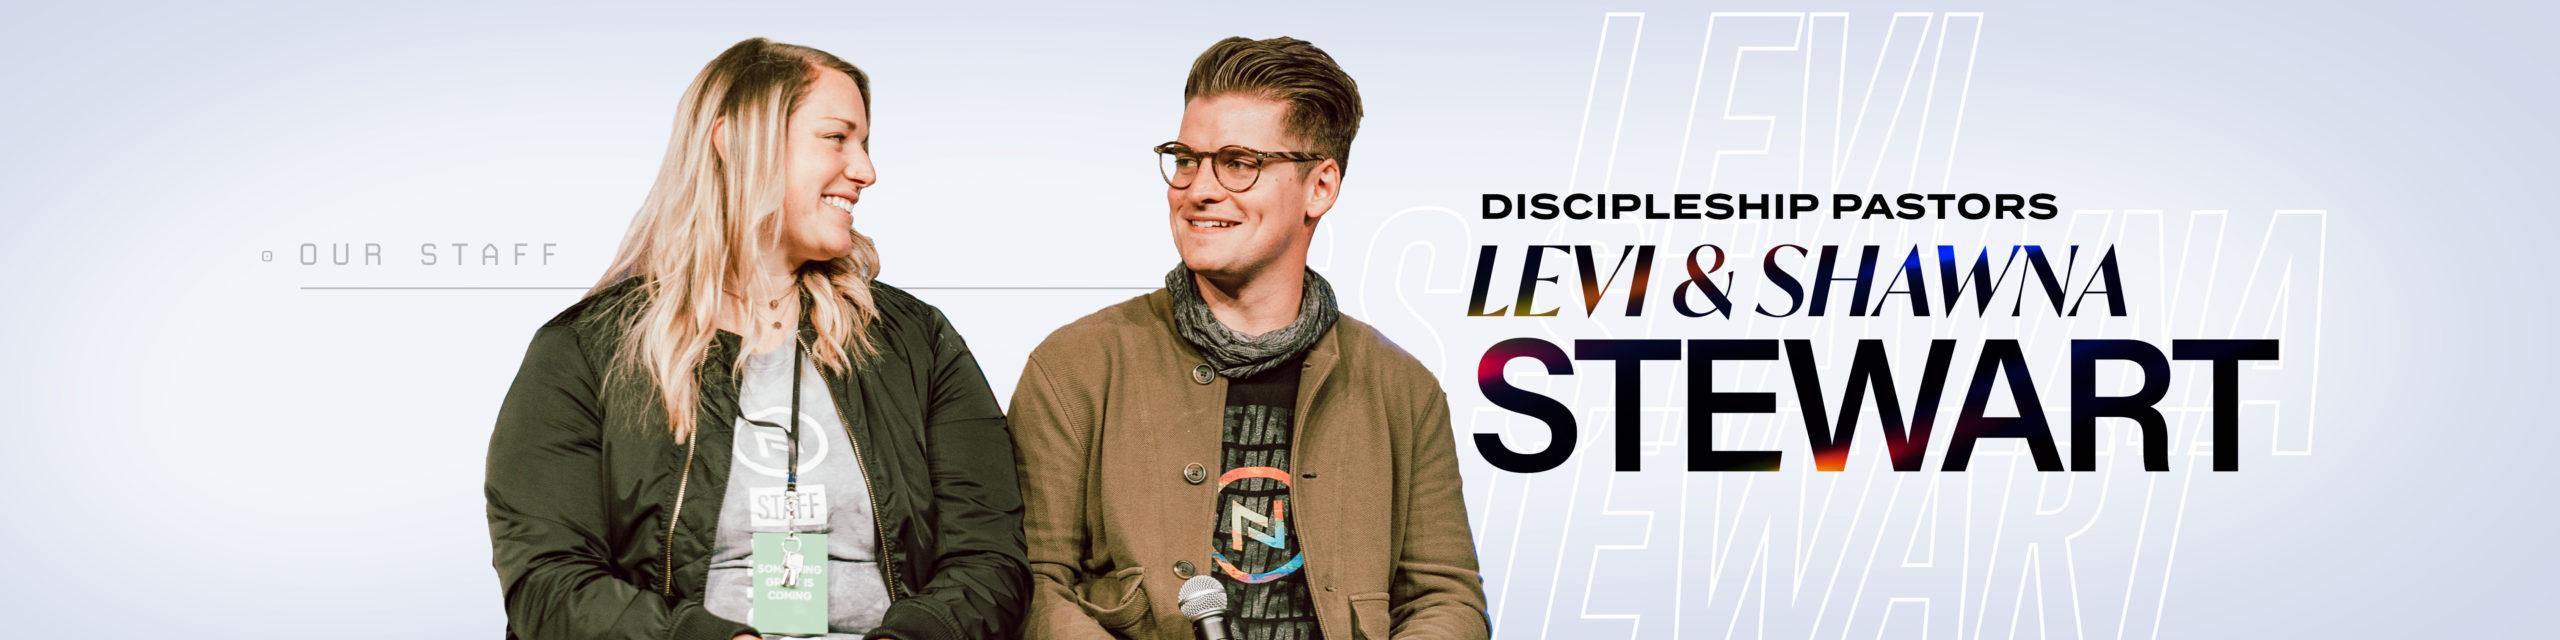 Levi and Shawna Stewart - Discipleship Pastors of Nations Church Orlando